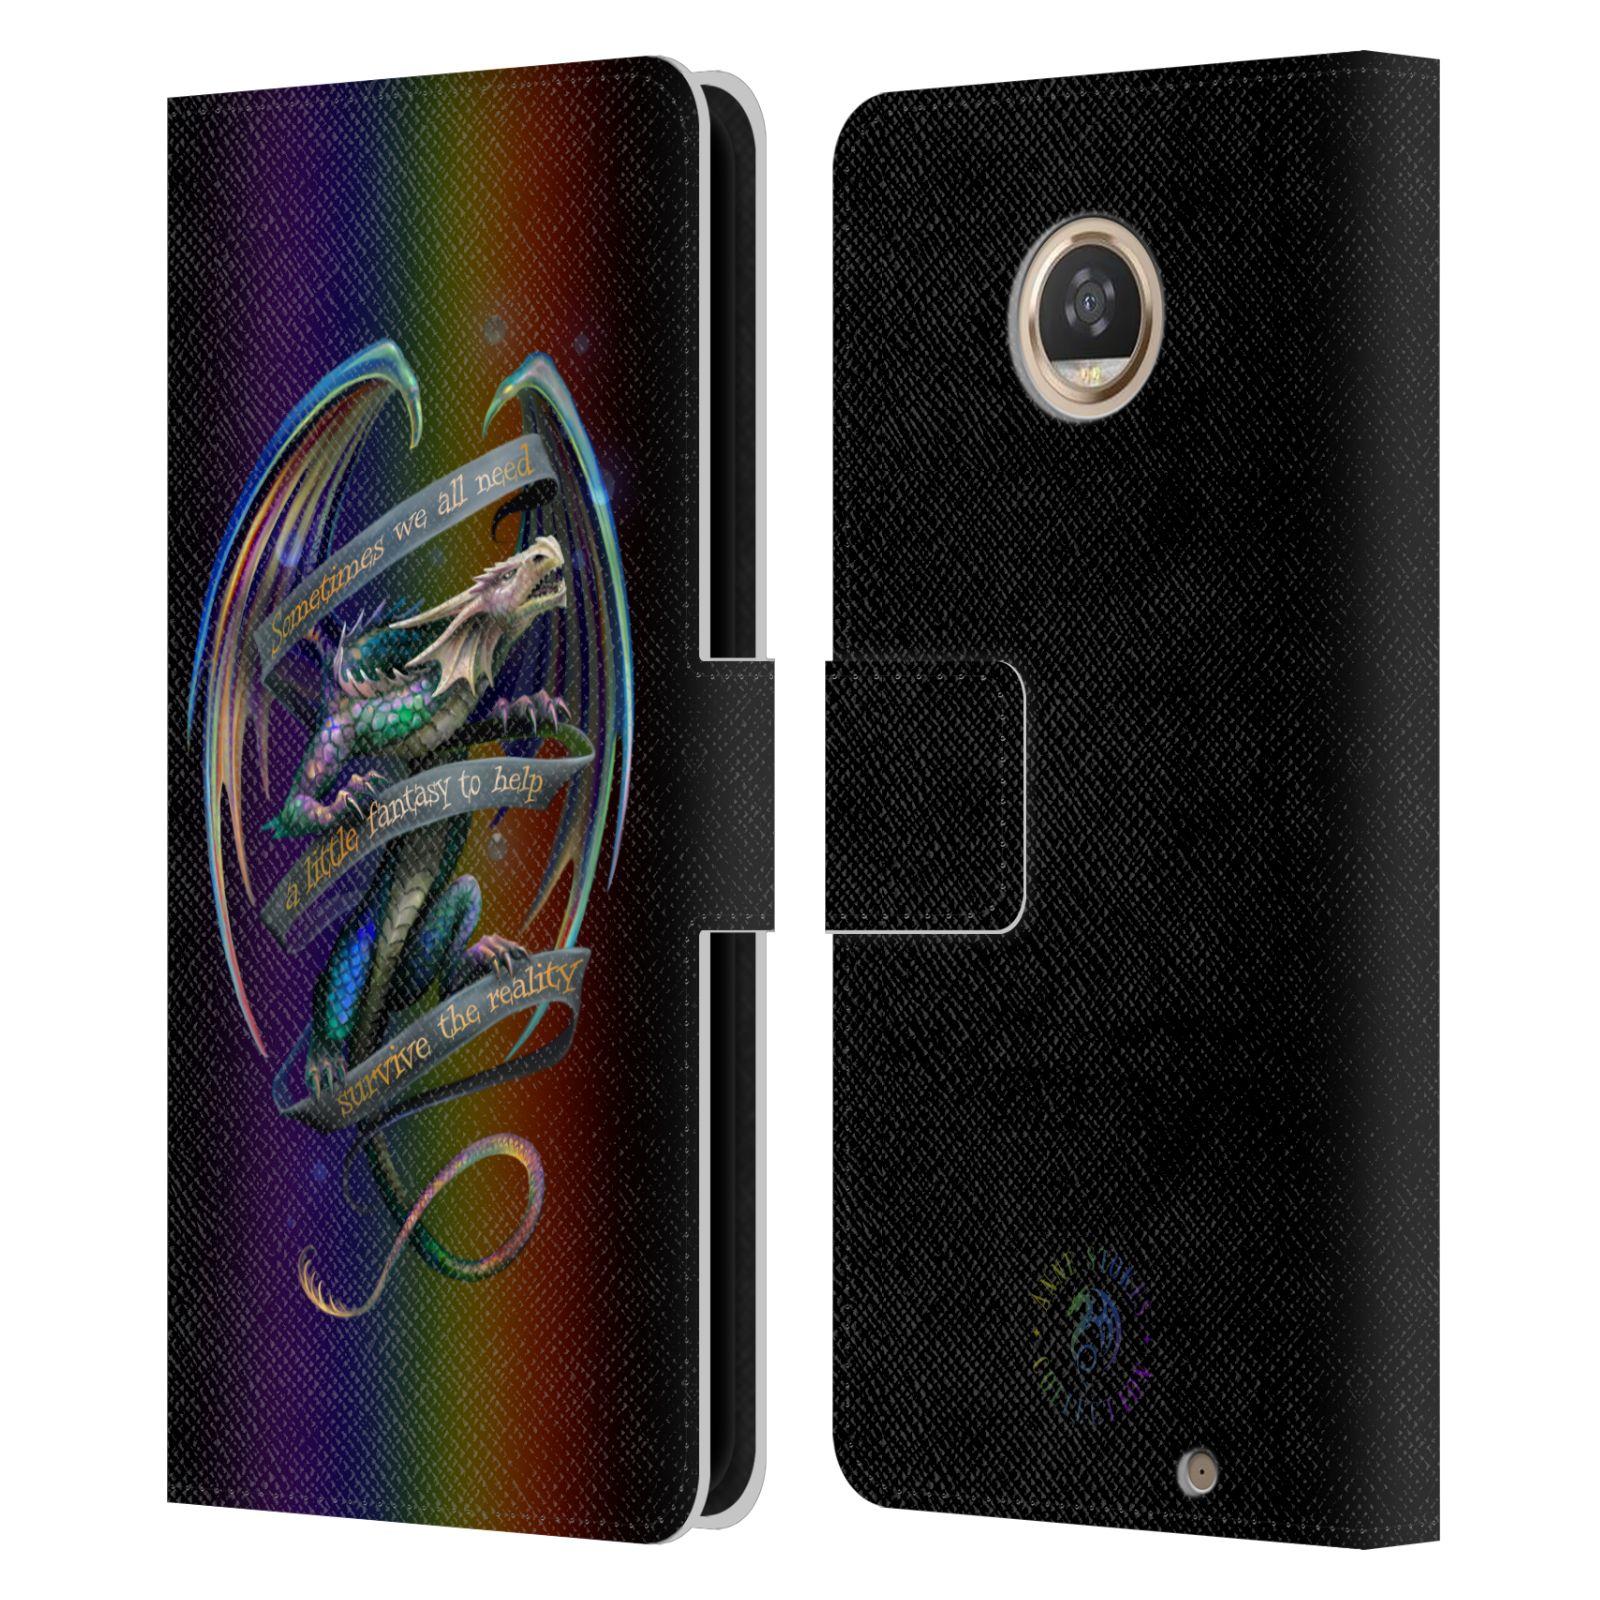 Moto G Pro Stylus セール特別価格 2020 G8 Power Lite E6 Plus Play E7 G10 Anne オフィシャル 電話 Motorola レザー手帳型ウォレットタイプケース 5G G7 Mot G30 ついに入荷 ファンタジー Stokes G9 ドラゴン